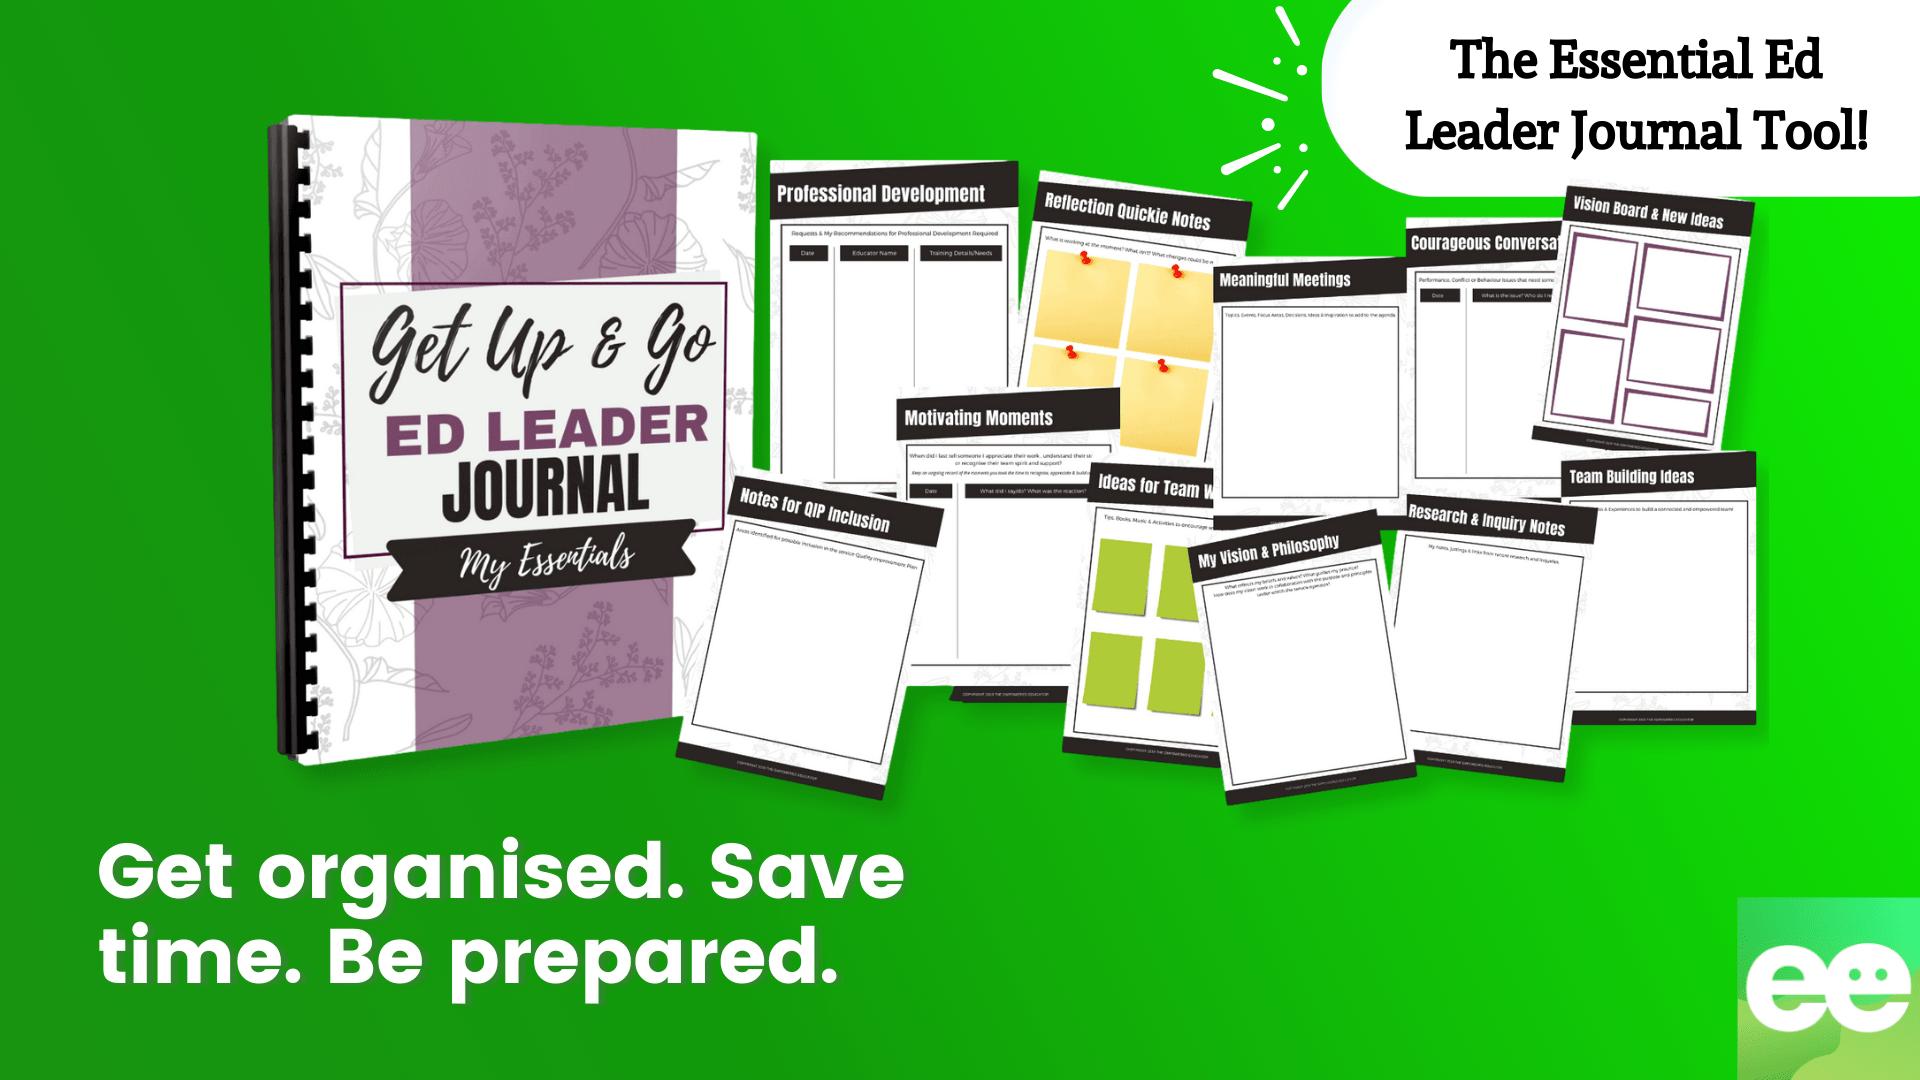 essential ed leader journal tool